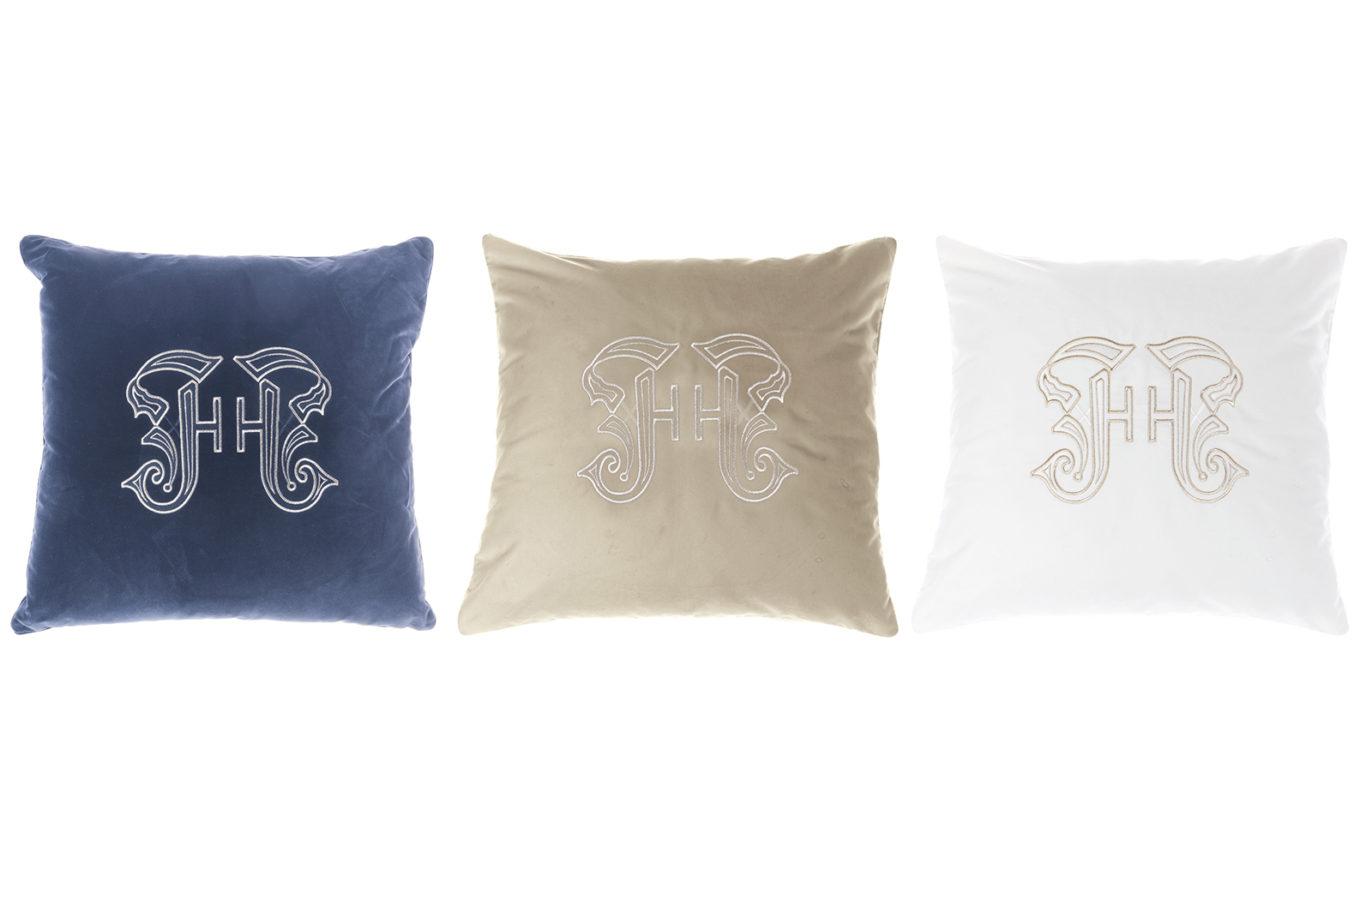 Gianfranco Ferre Home Burlesque Cushion 02